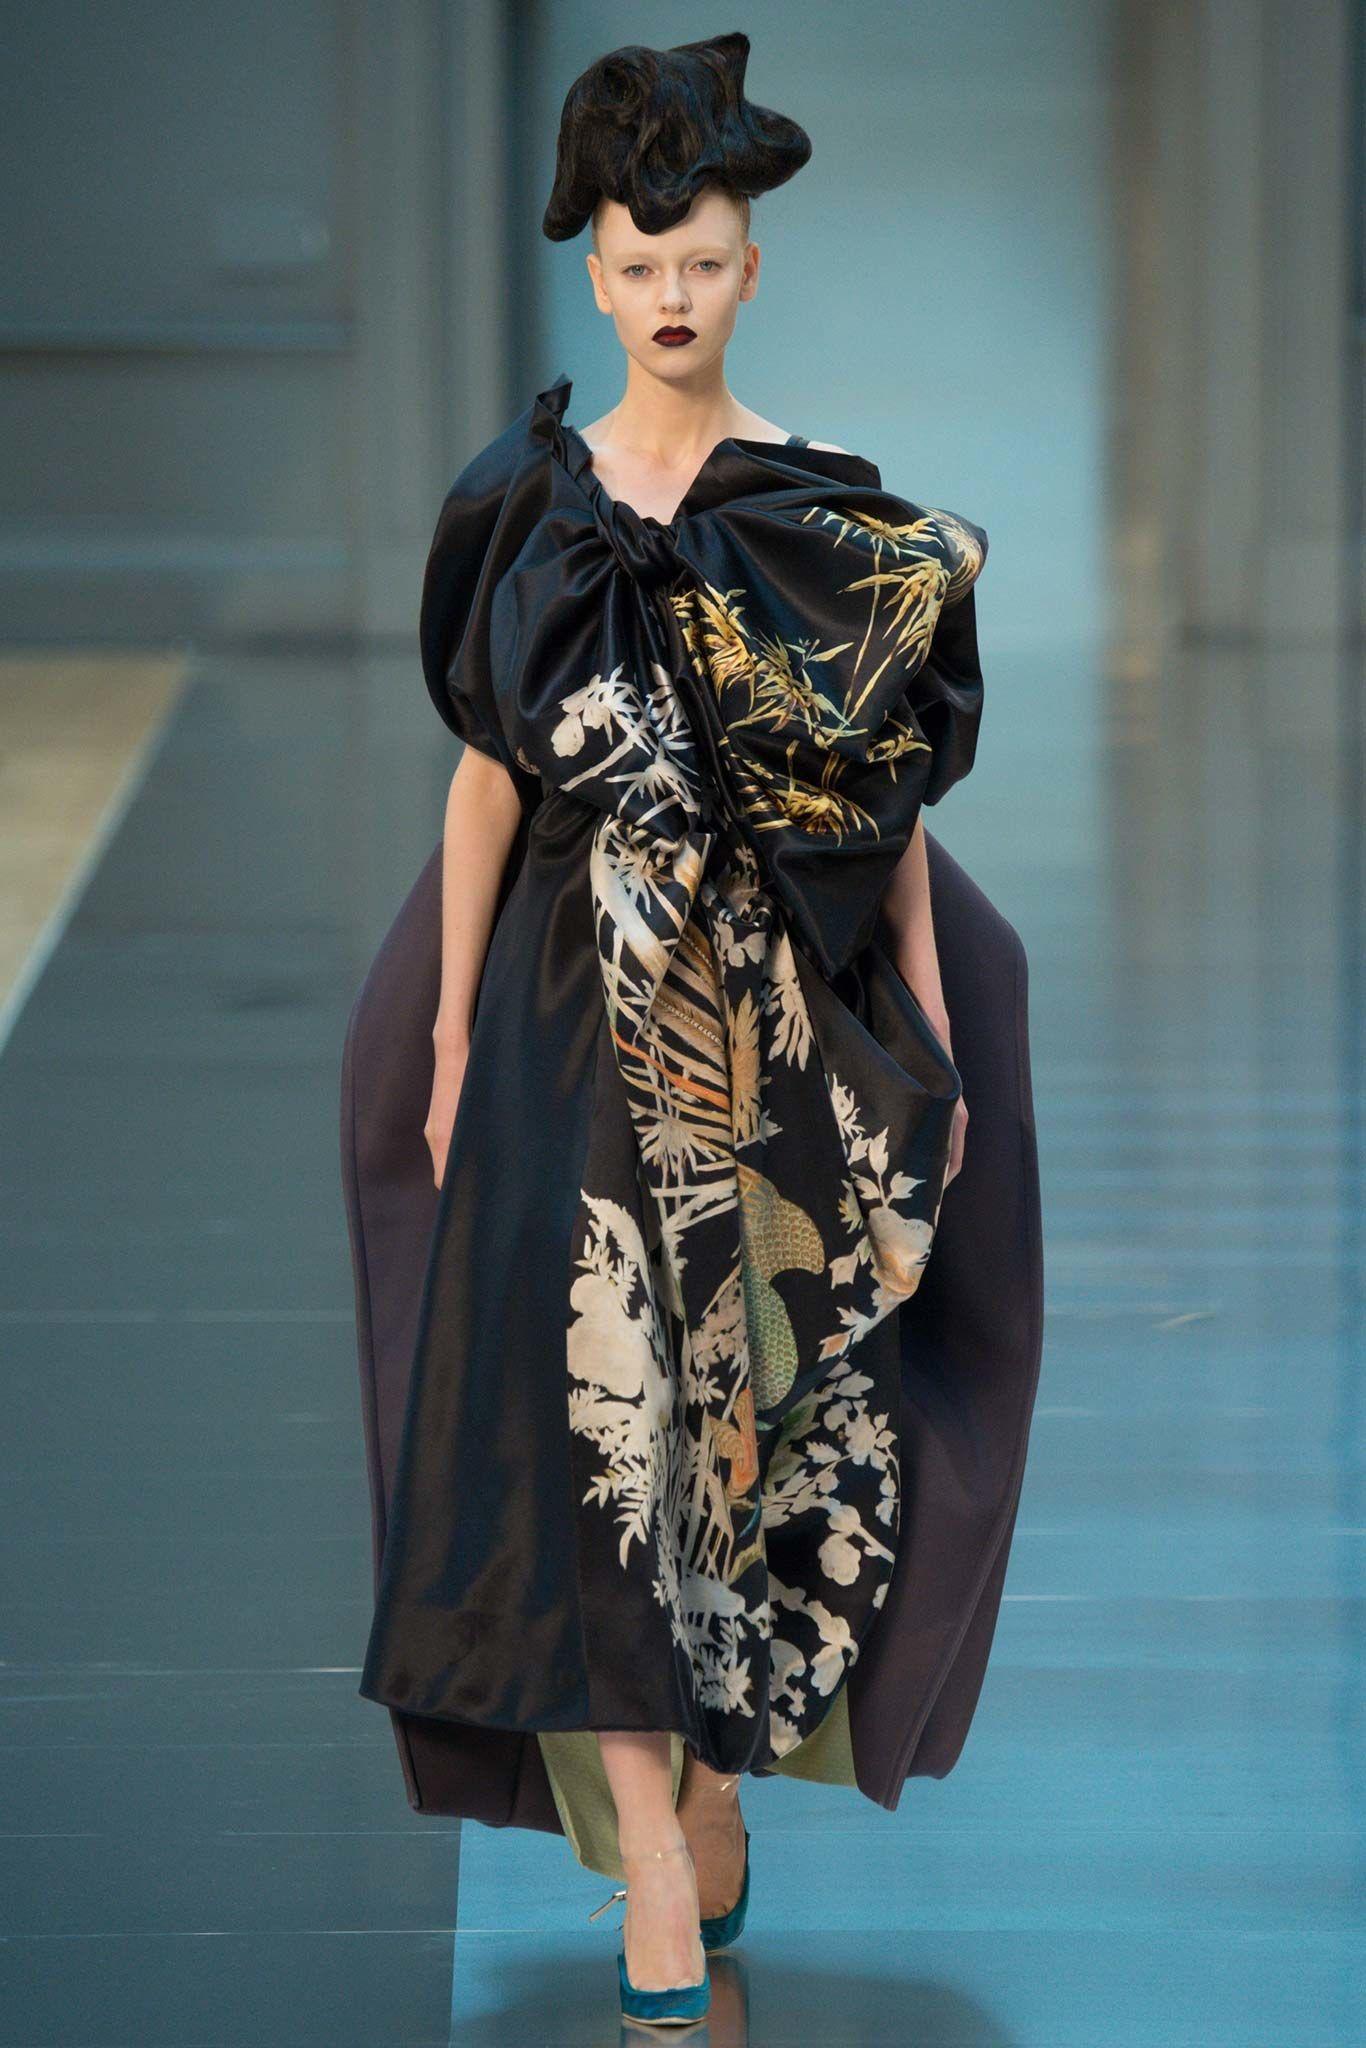 Maison Margiela Fall 2015 Couture Collection Photos - Vogue